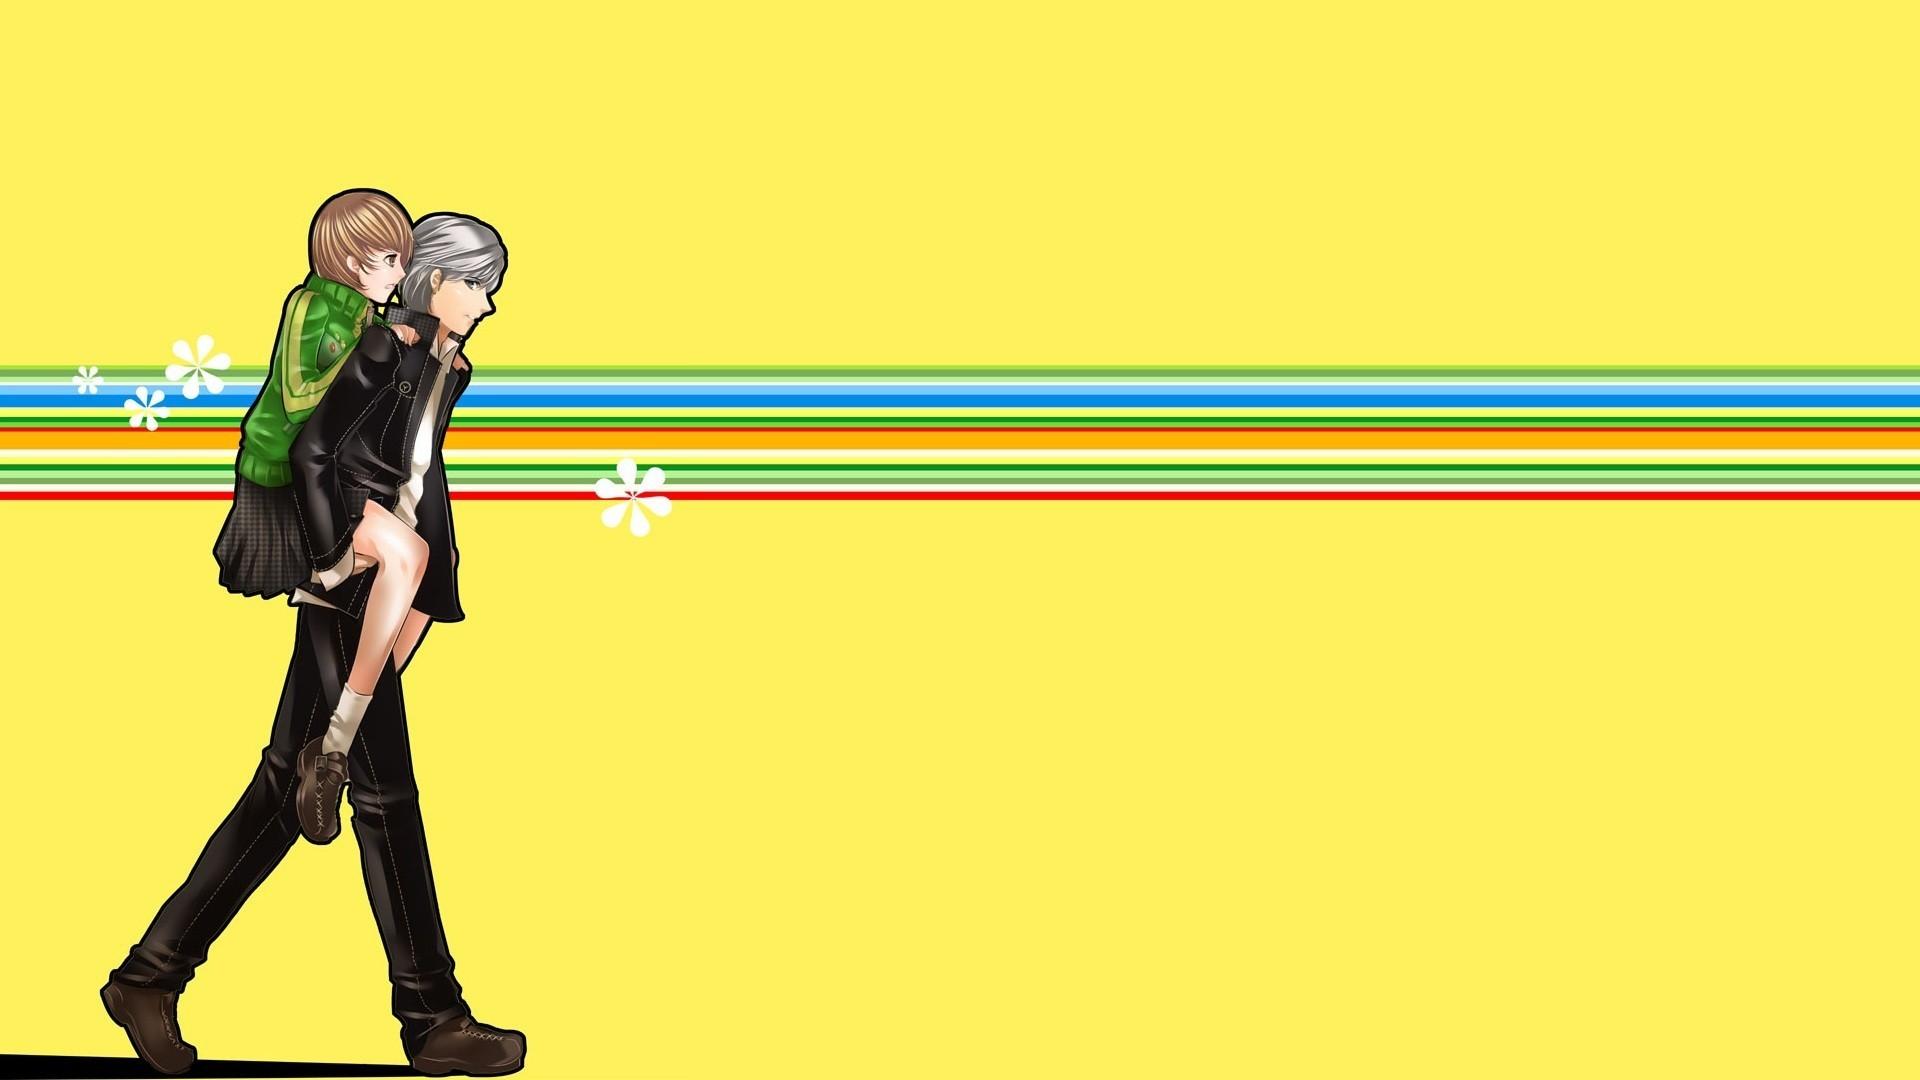 multicolor, Persona series, Persona 4, anime boys, anime girls – Free  Wallpaper / WallpaperJam.com